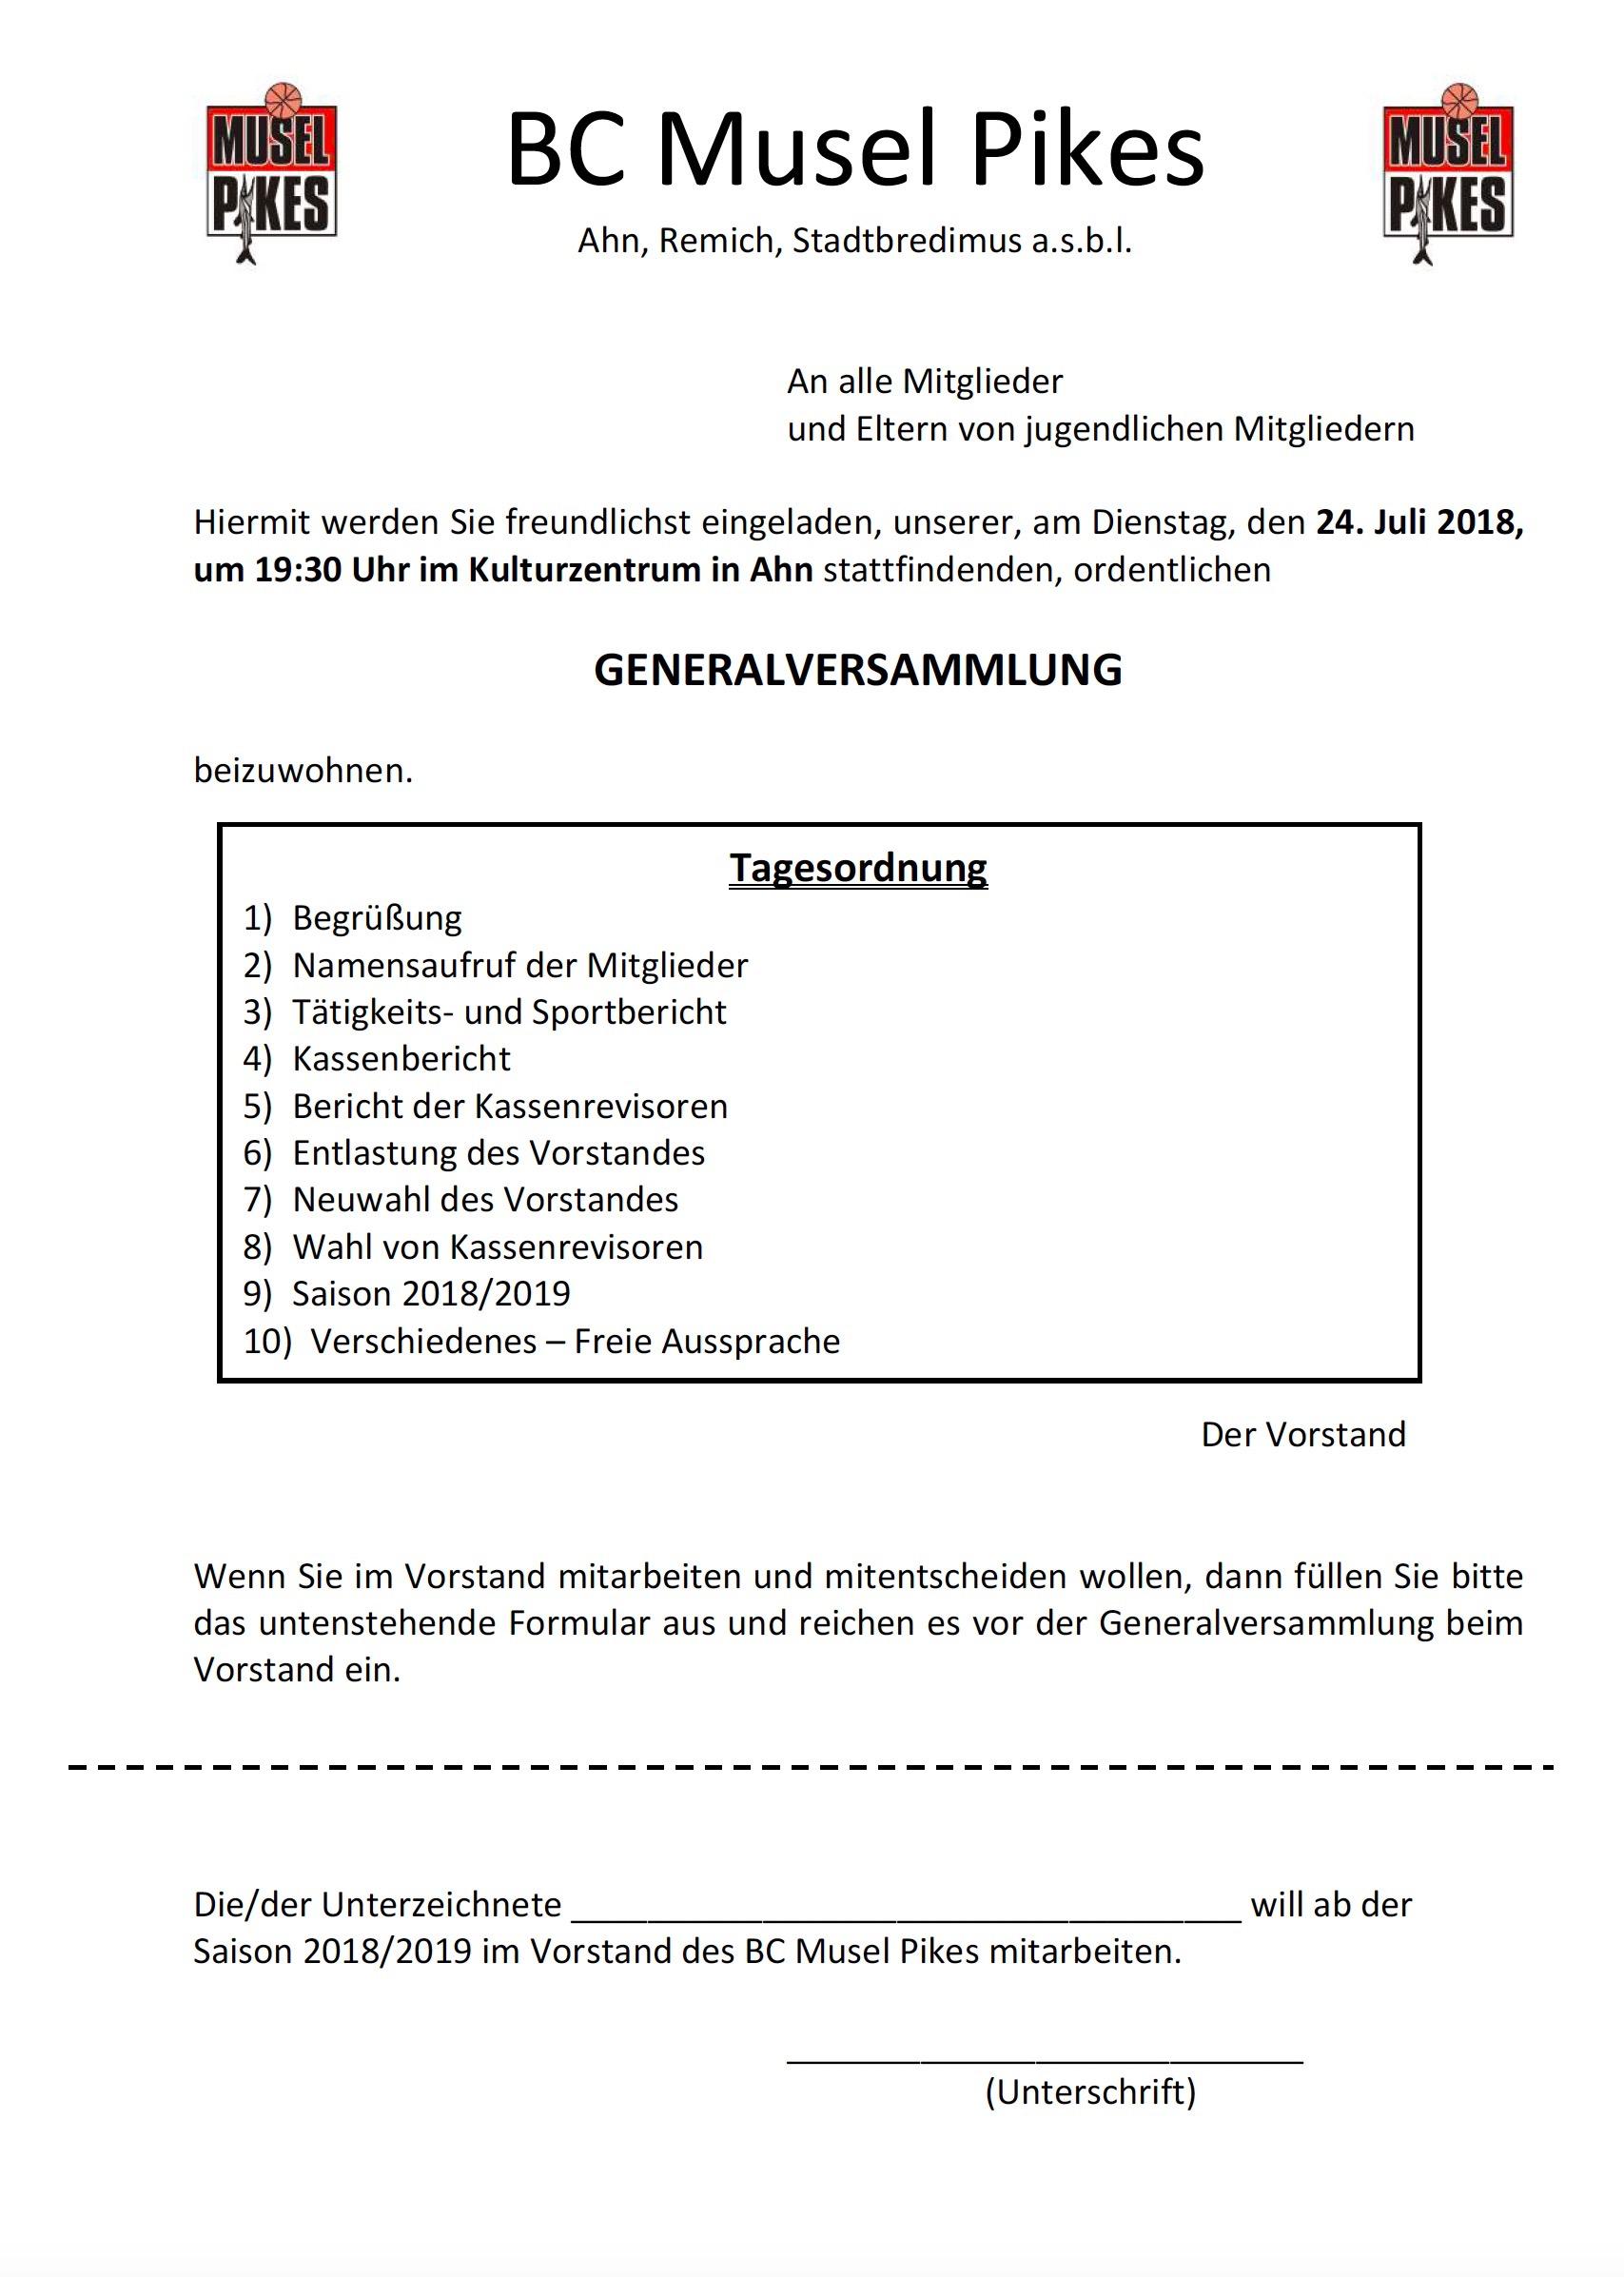 Generalversammlung den 24. Juli 2018 um 19:30 Auer zu Ohn